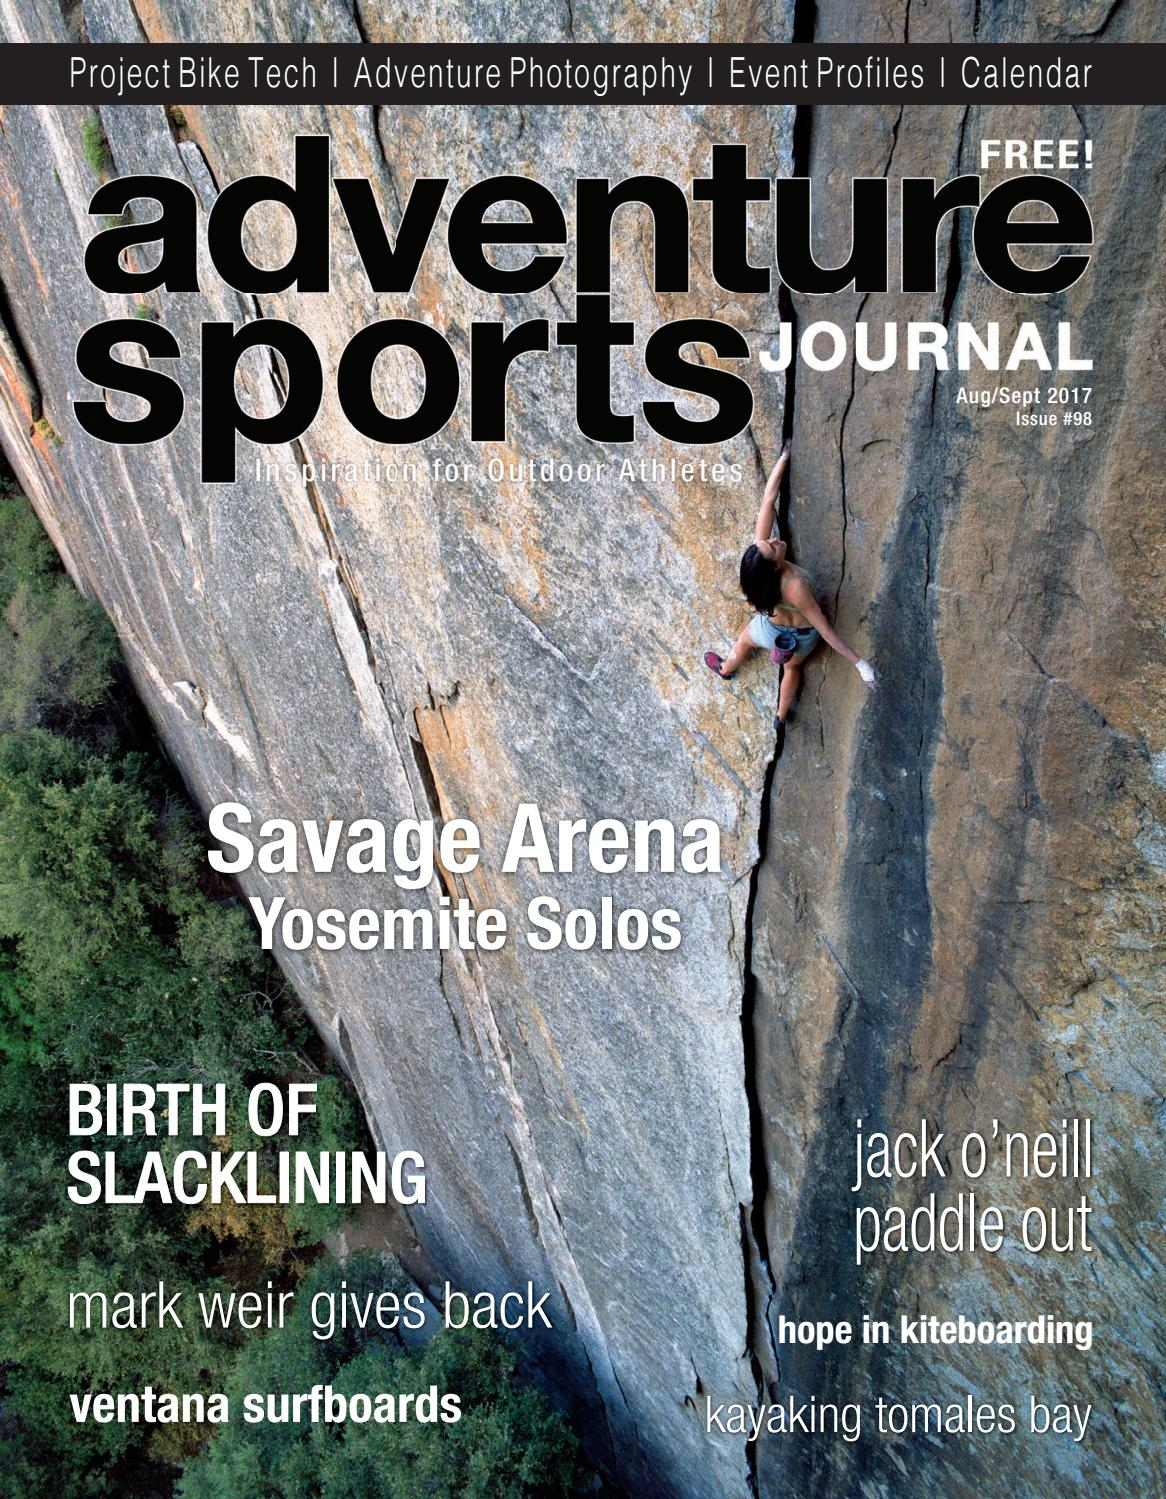 Adenture Sports Journal    Aug Sept 2017     98 by Adventure Sports Journal  - issuu 75a8224d4